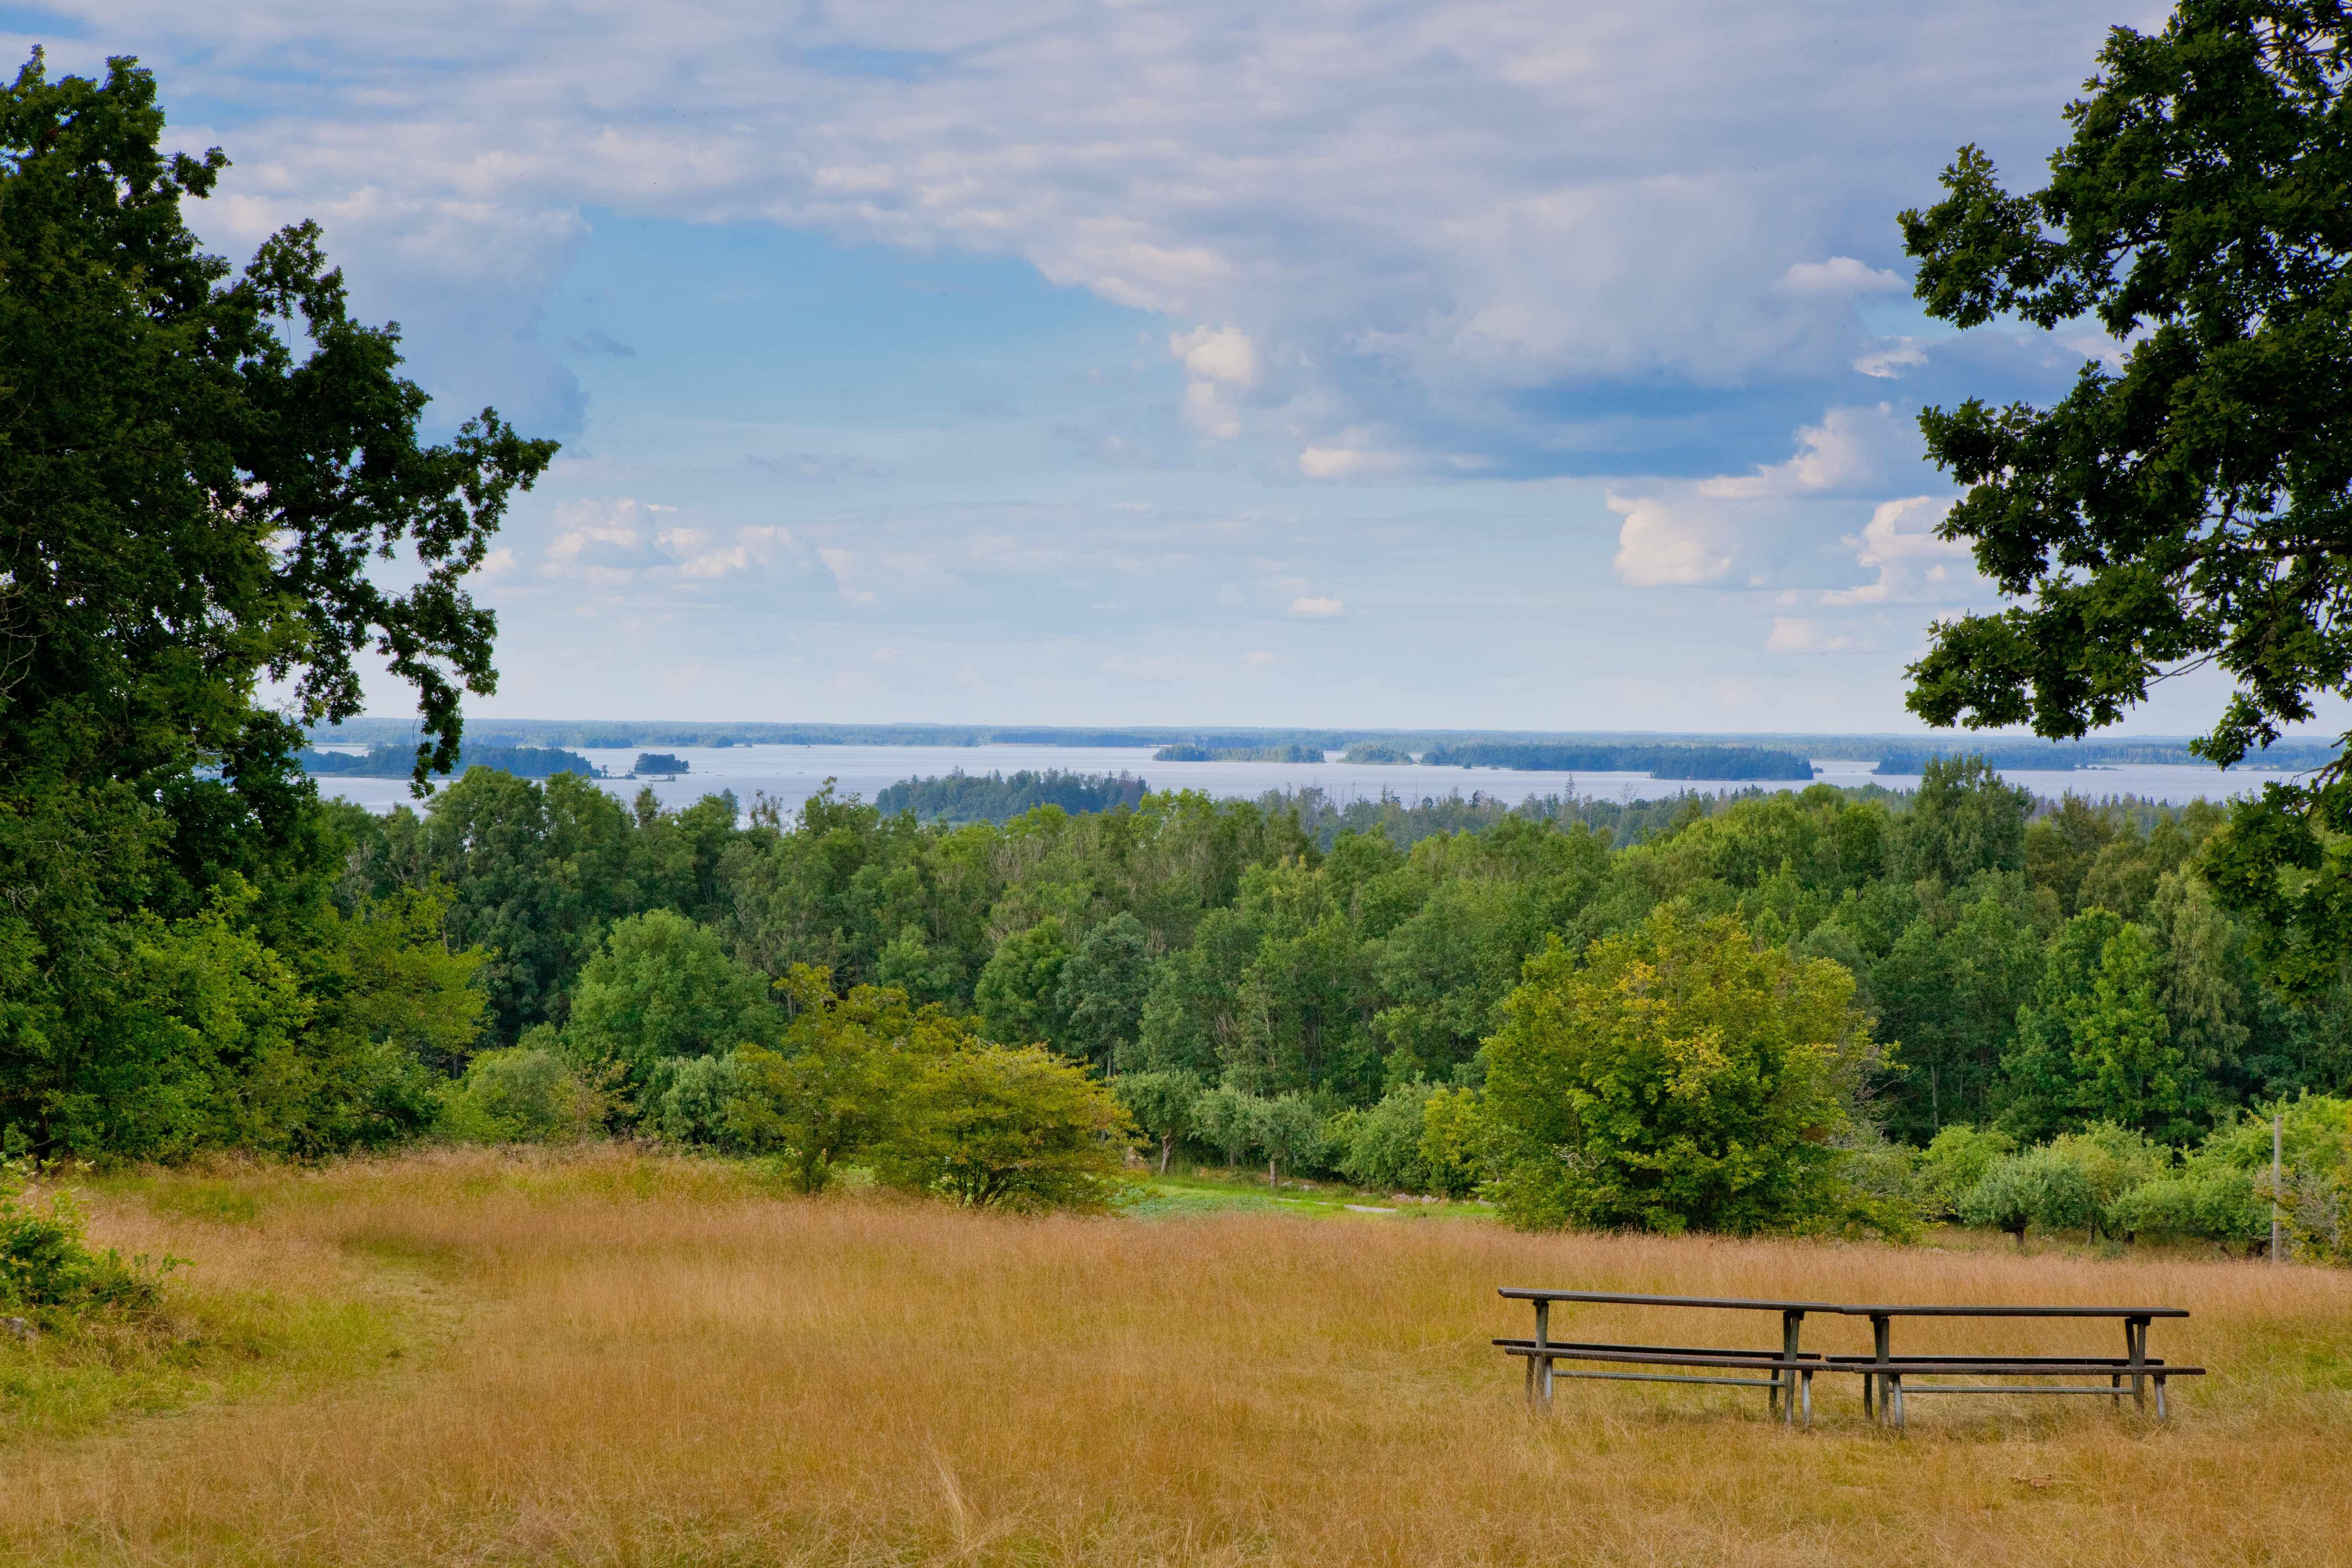 PeKa-foto,  © Tingsryds Kommun, Utsikt över sjön Åsnen